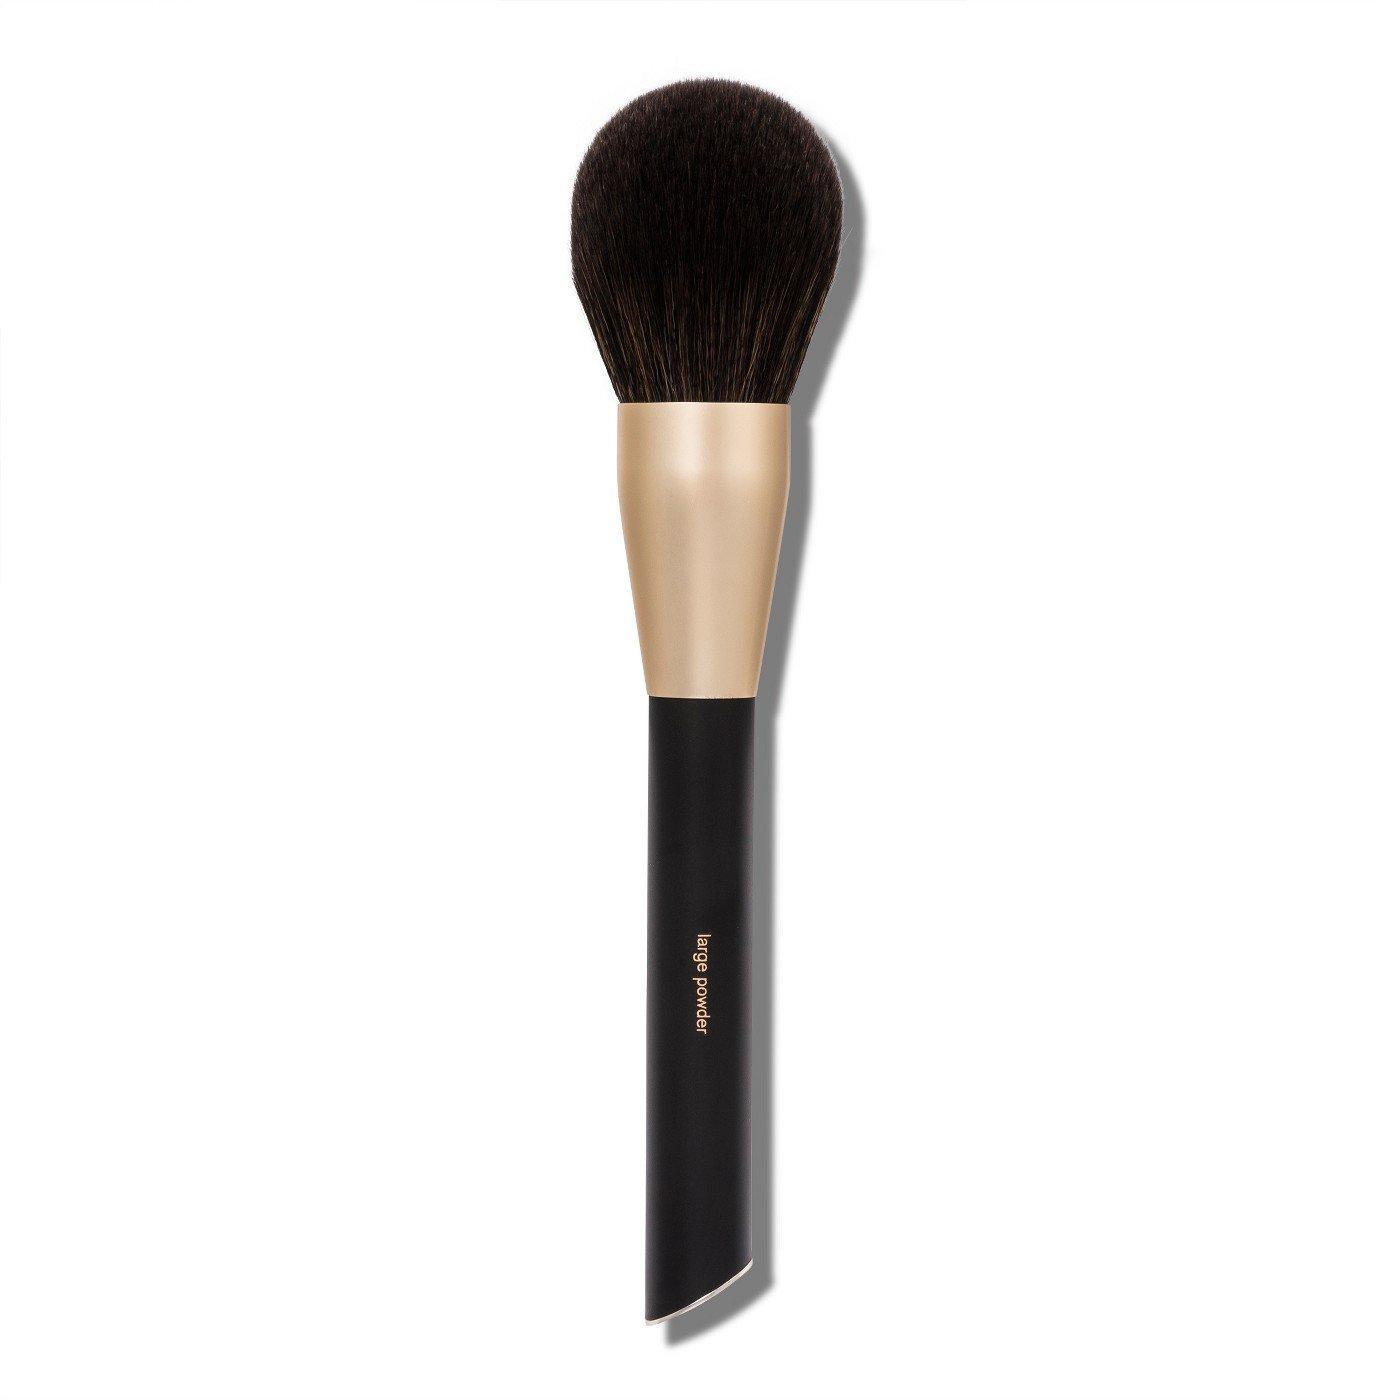 Sonia Kashuk Face Large Powder Brush Black and Gold